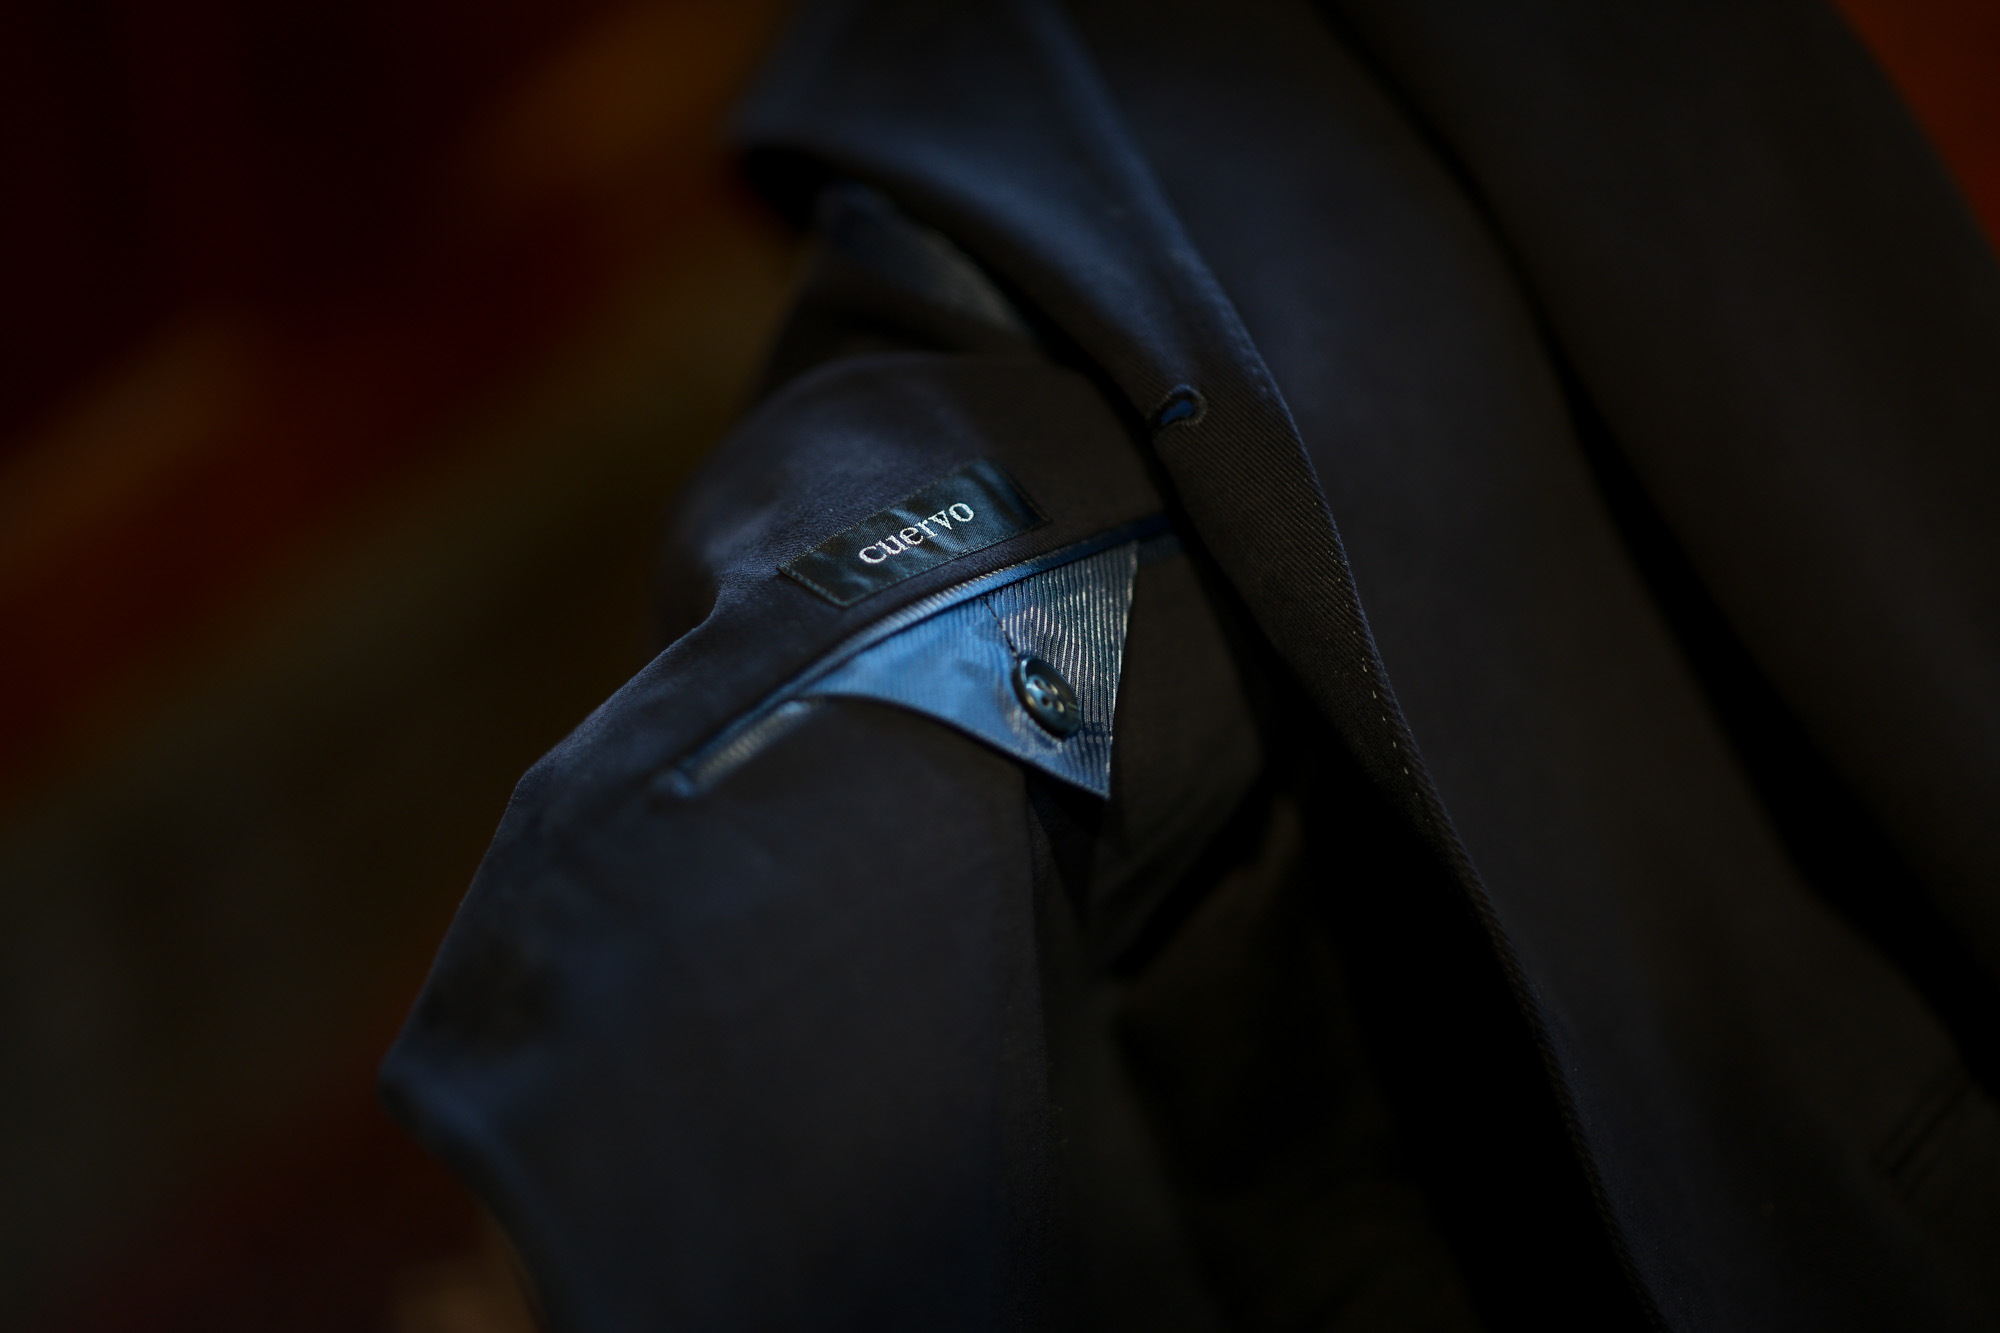 Cuervo (クエルボ) Sartoria Collection (サルトリア コレクション) Rooster (ルースター) STRETCH COTTON ストレッチコットン スーツ NAVY (ネイビー) MADE IN JAPAN (日本製) 2019 春夏新作 alto e diritto アルトエデリット